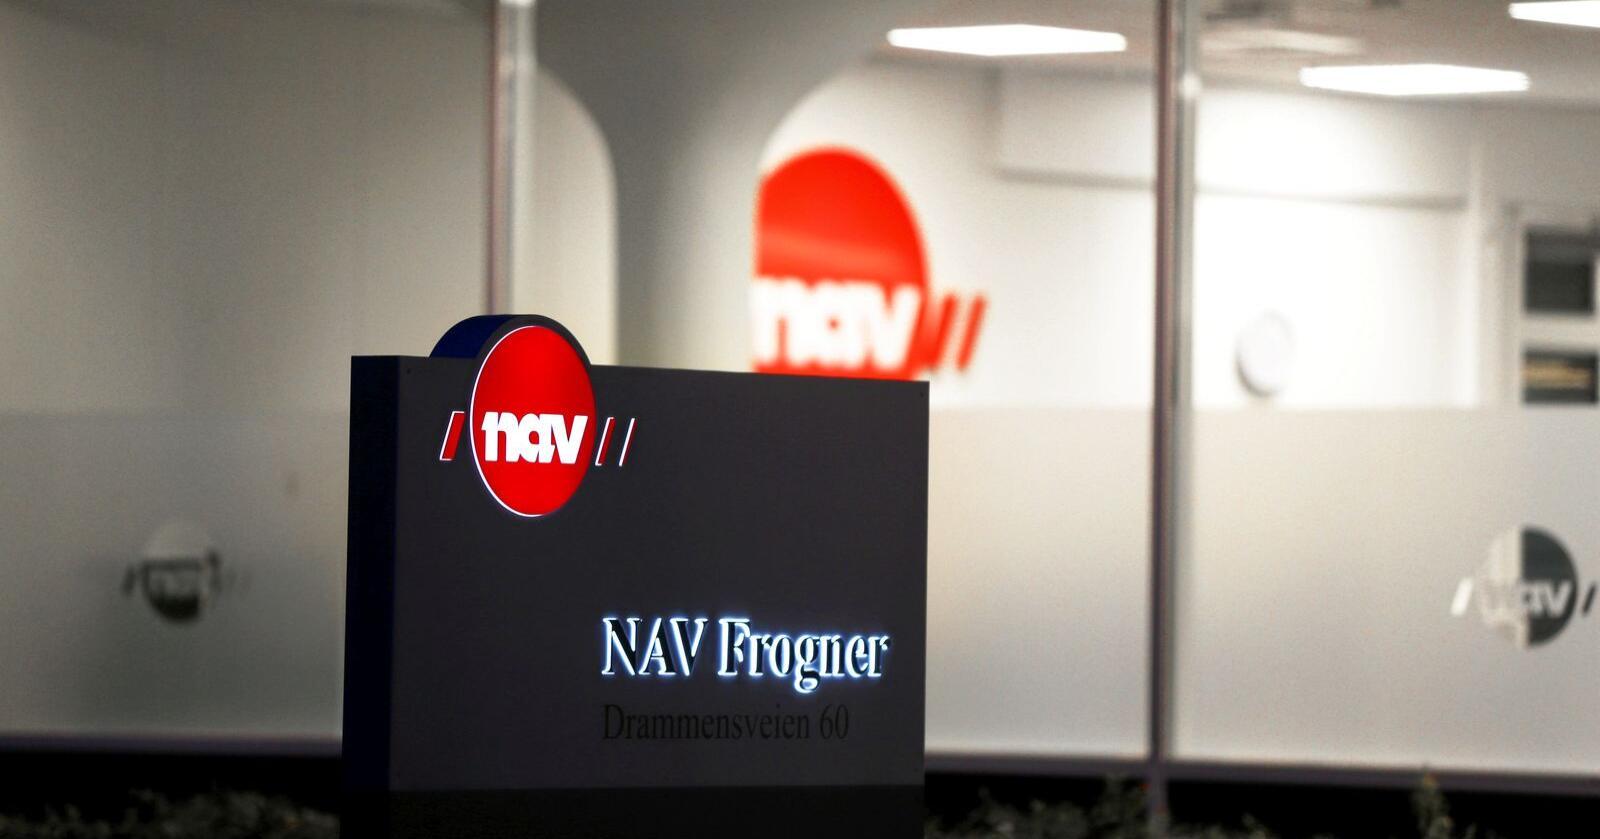 Også et reguleringslager: Nav. Foto: Ørn E. Borgen / NTB scanpix